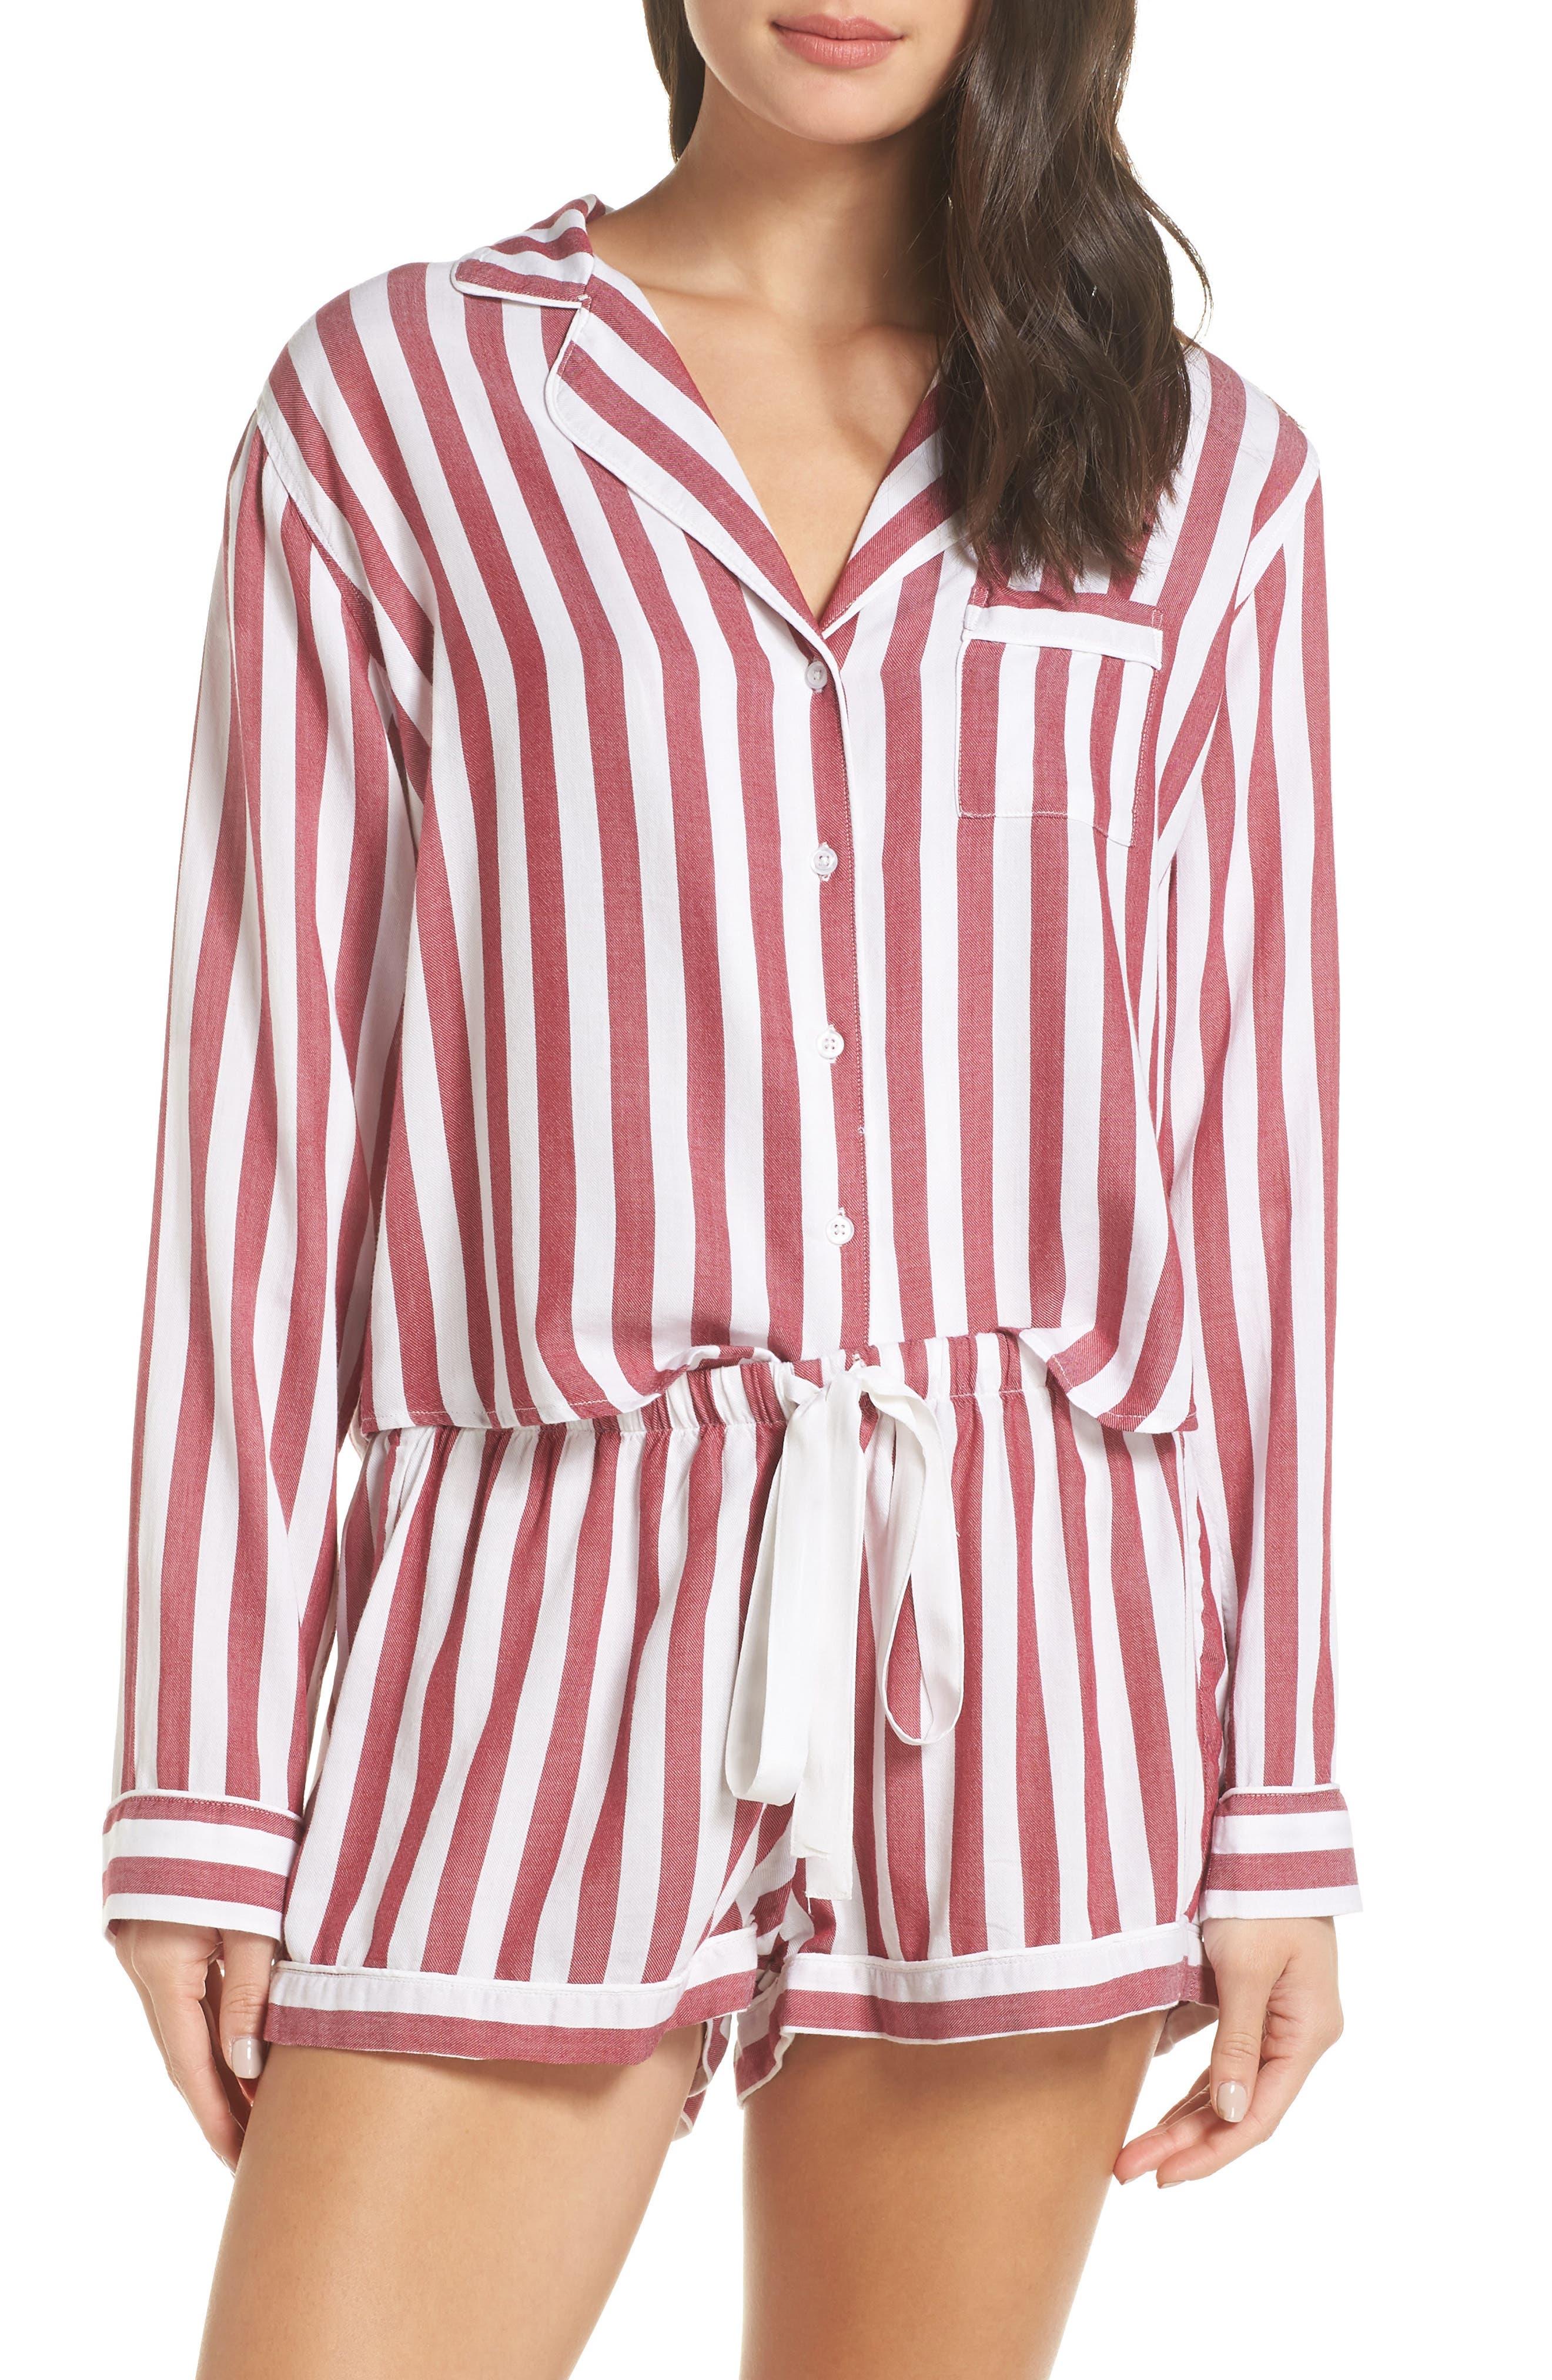 Stripe Short Pajamas,                             Alternate thumbnail 6, color,                             TOLEDO STRIPE